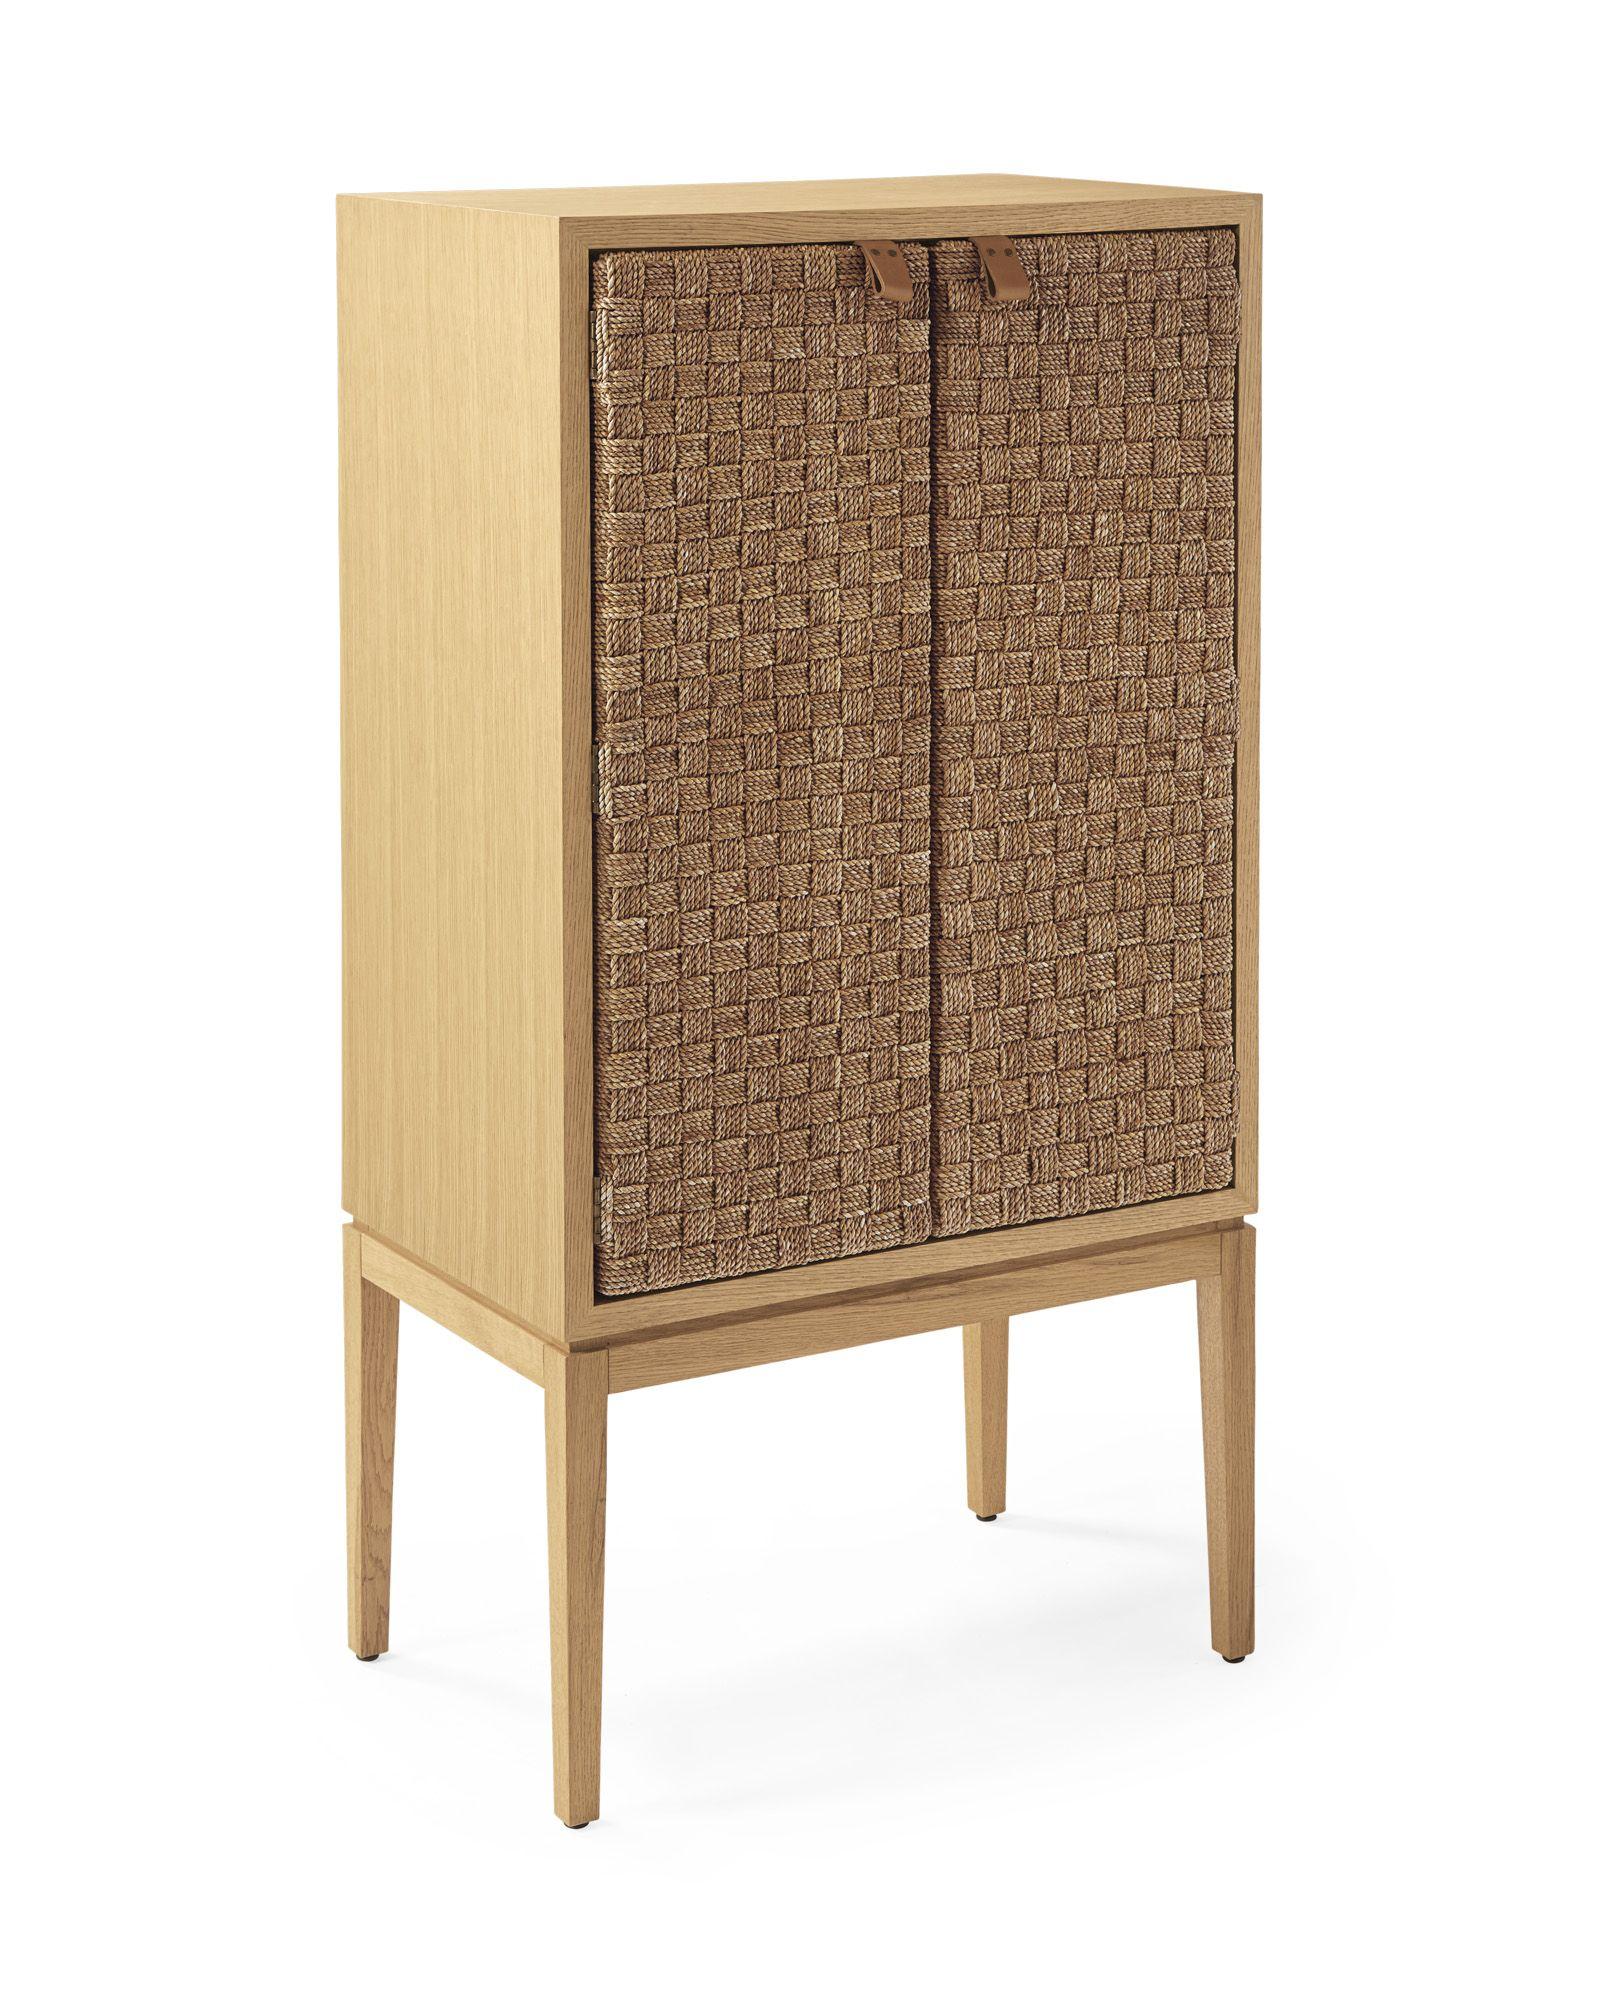 Caledonia Woven Bar Cabinet | Serena & Lily | $4500